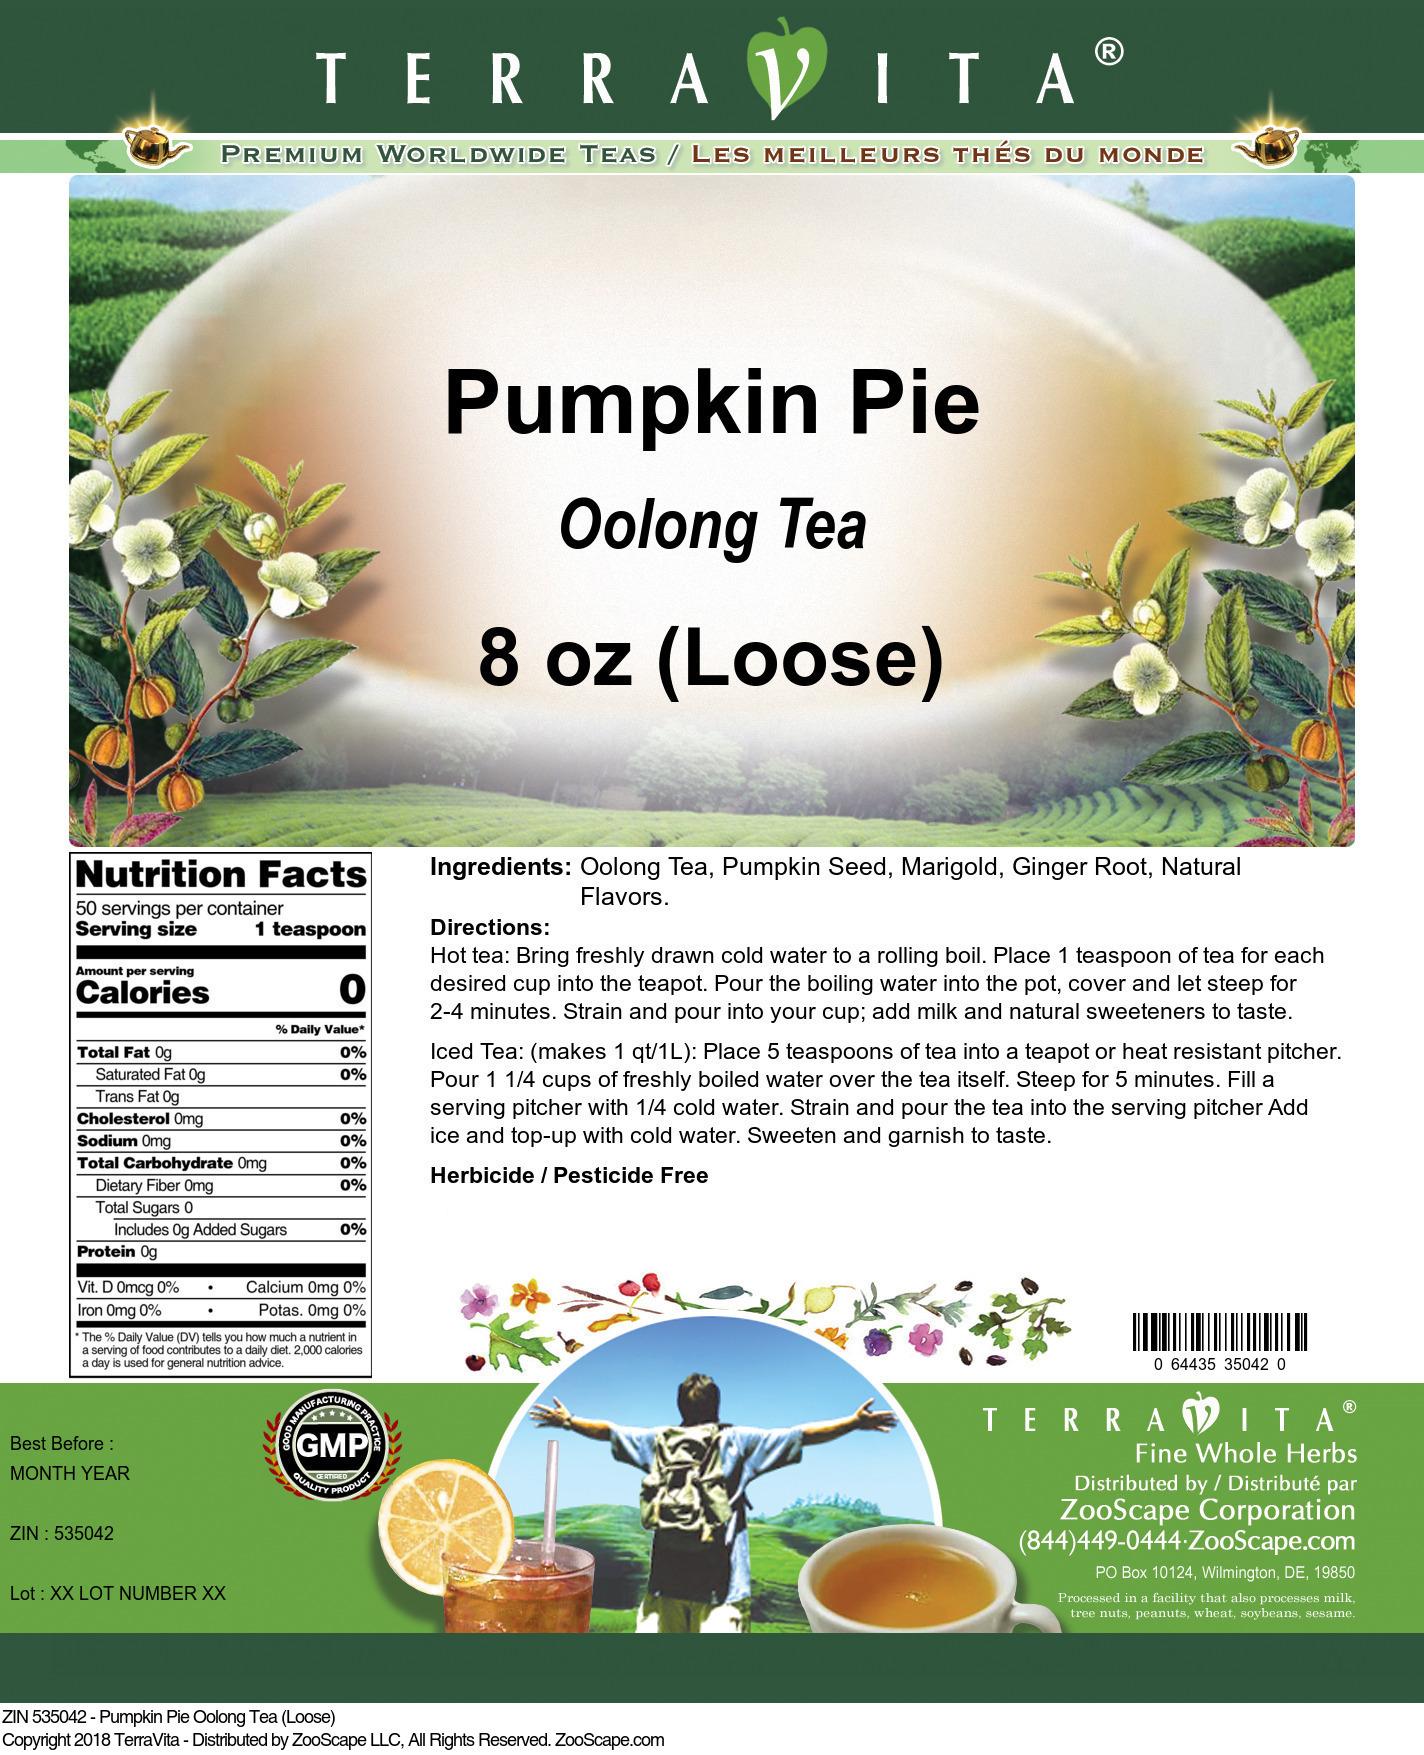 Pumpkin Pie Oolong Tea (Loose)